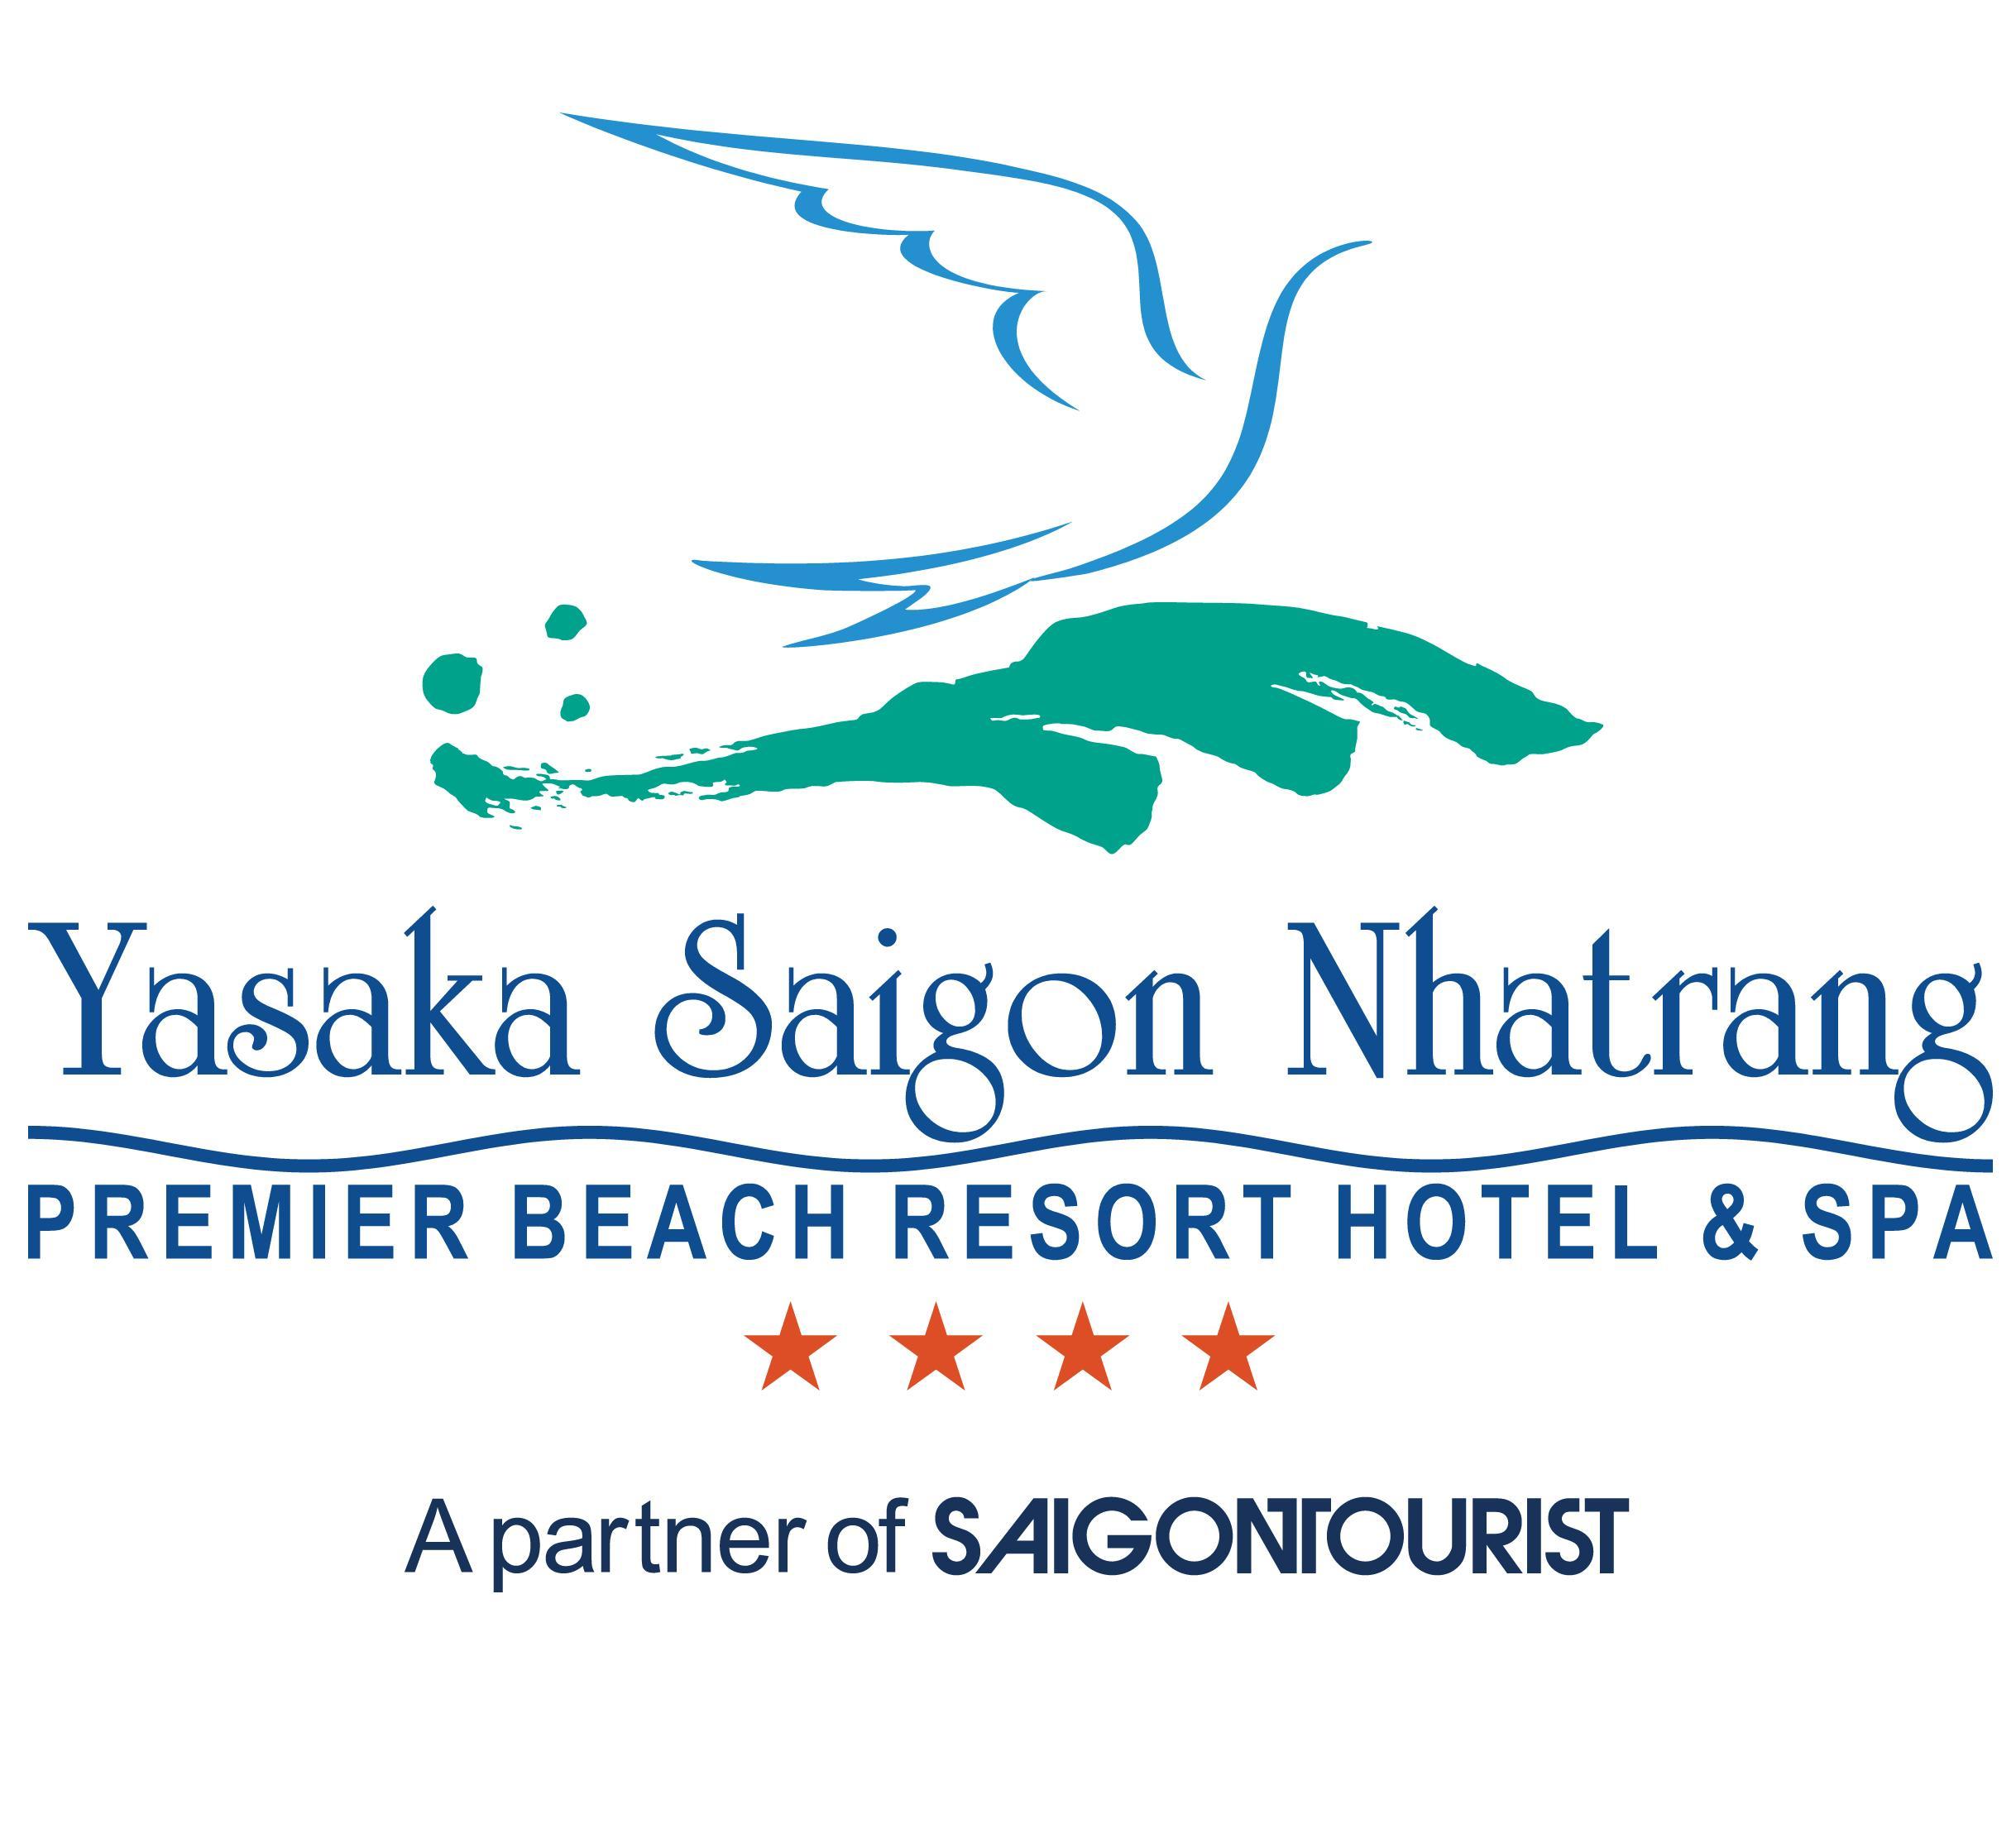 YASAKA - SAIGON-NHATRANG JOINT STOCK COMPANY